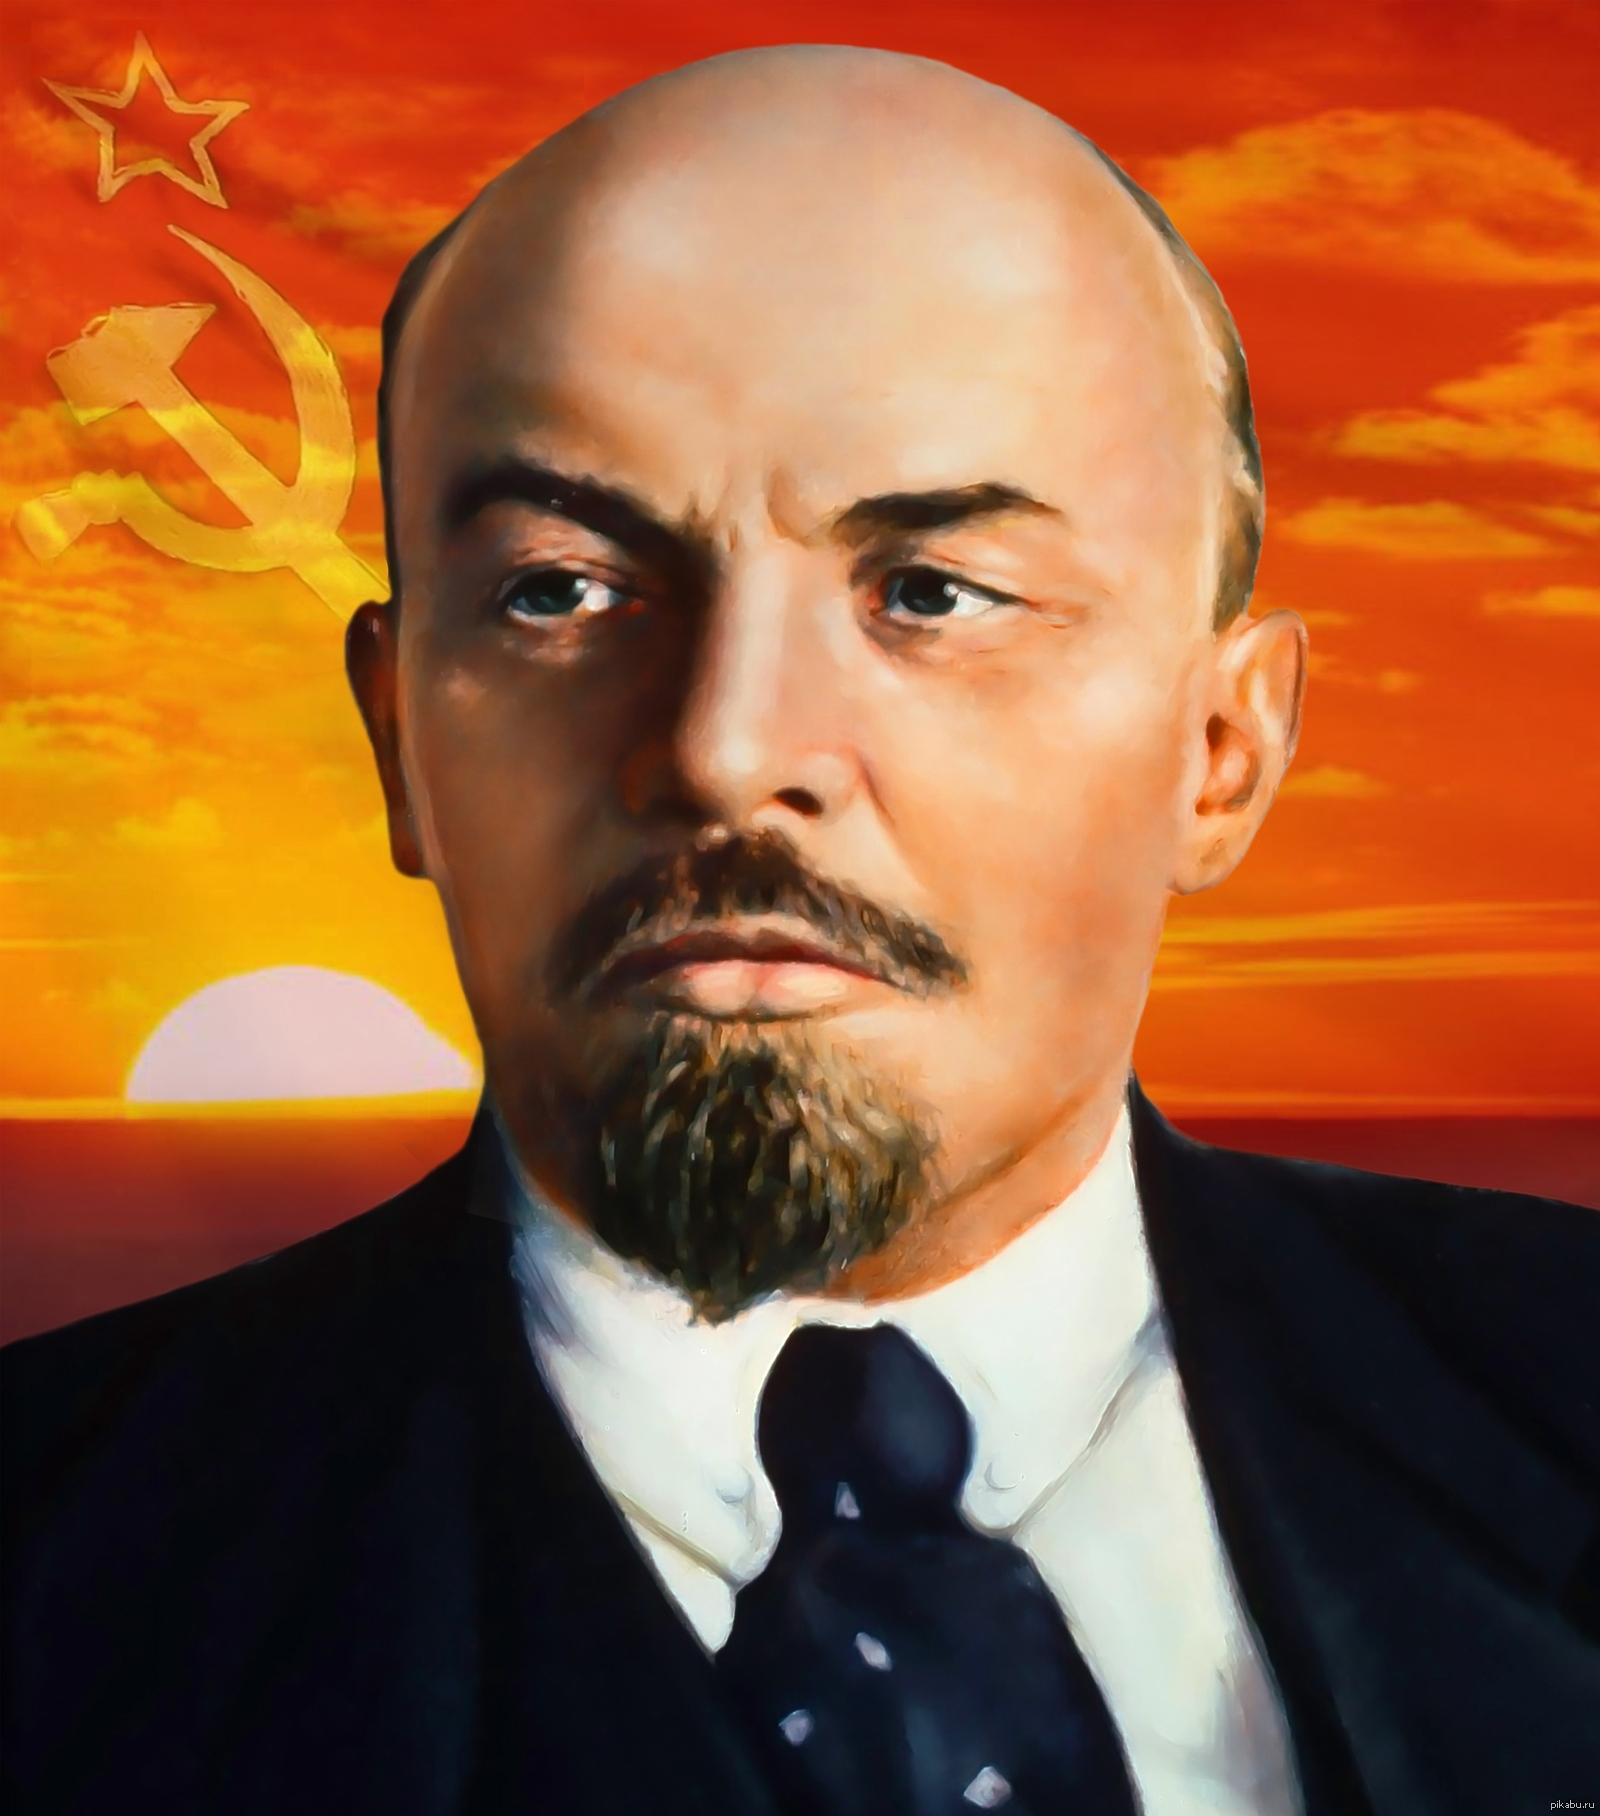 https://cs6.pikabu.ru/post_img/big/2014/04/22/8/1398170440_711429637.jpg